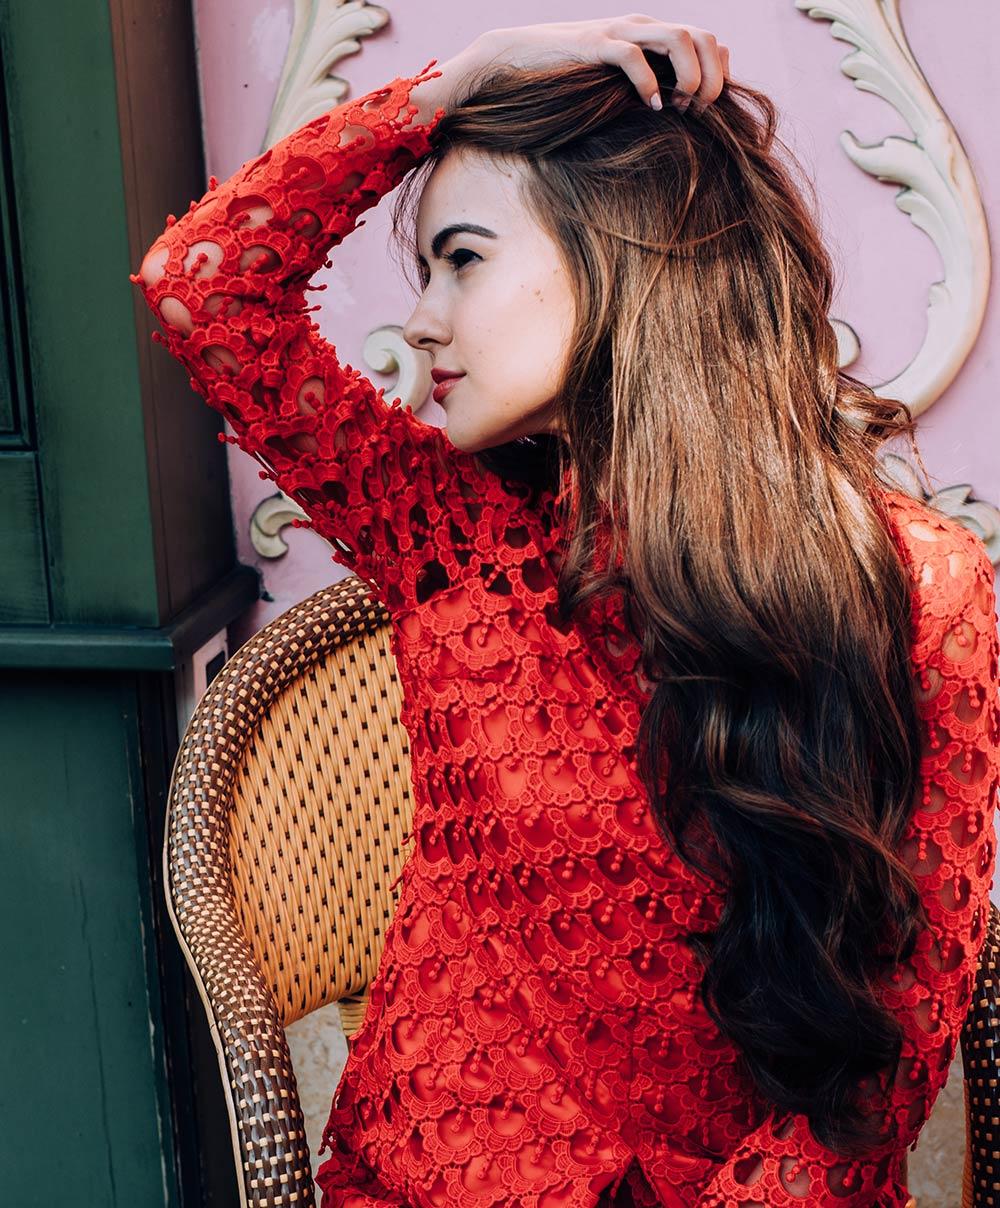 Vive Hair Hacks: 5 Easy Fixes for Dry Hair